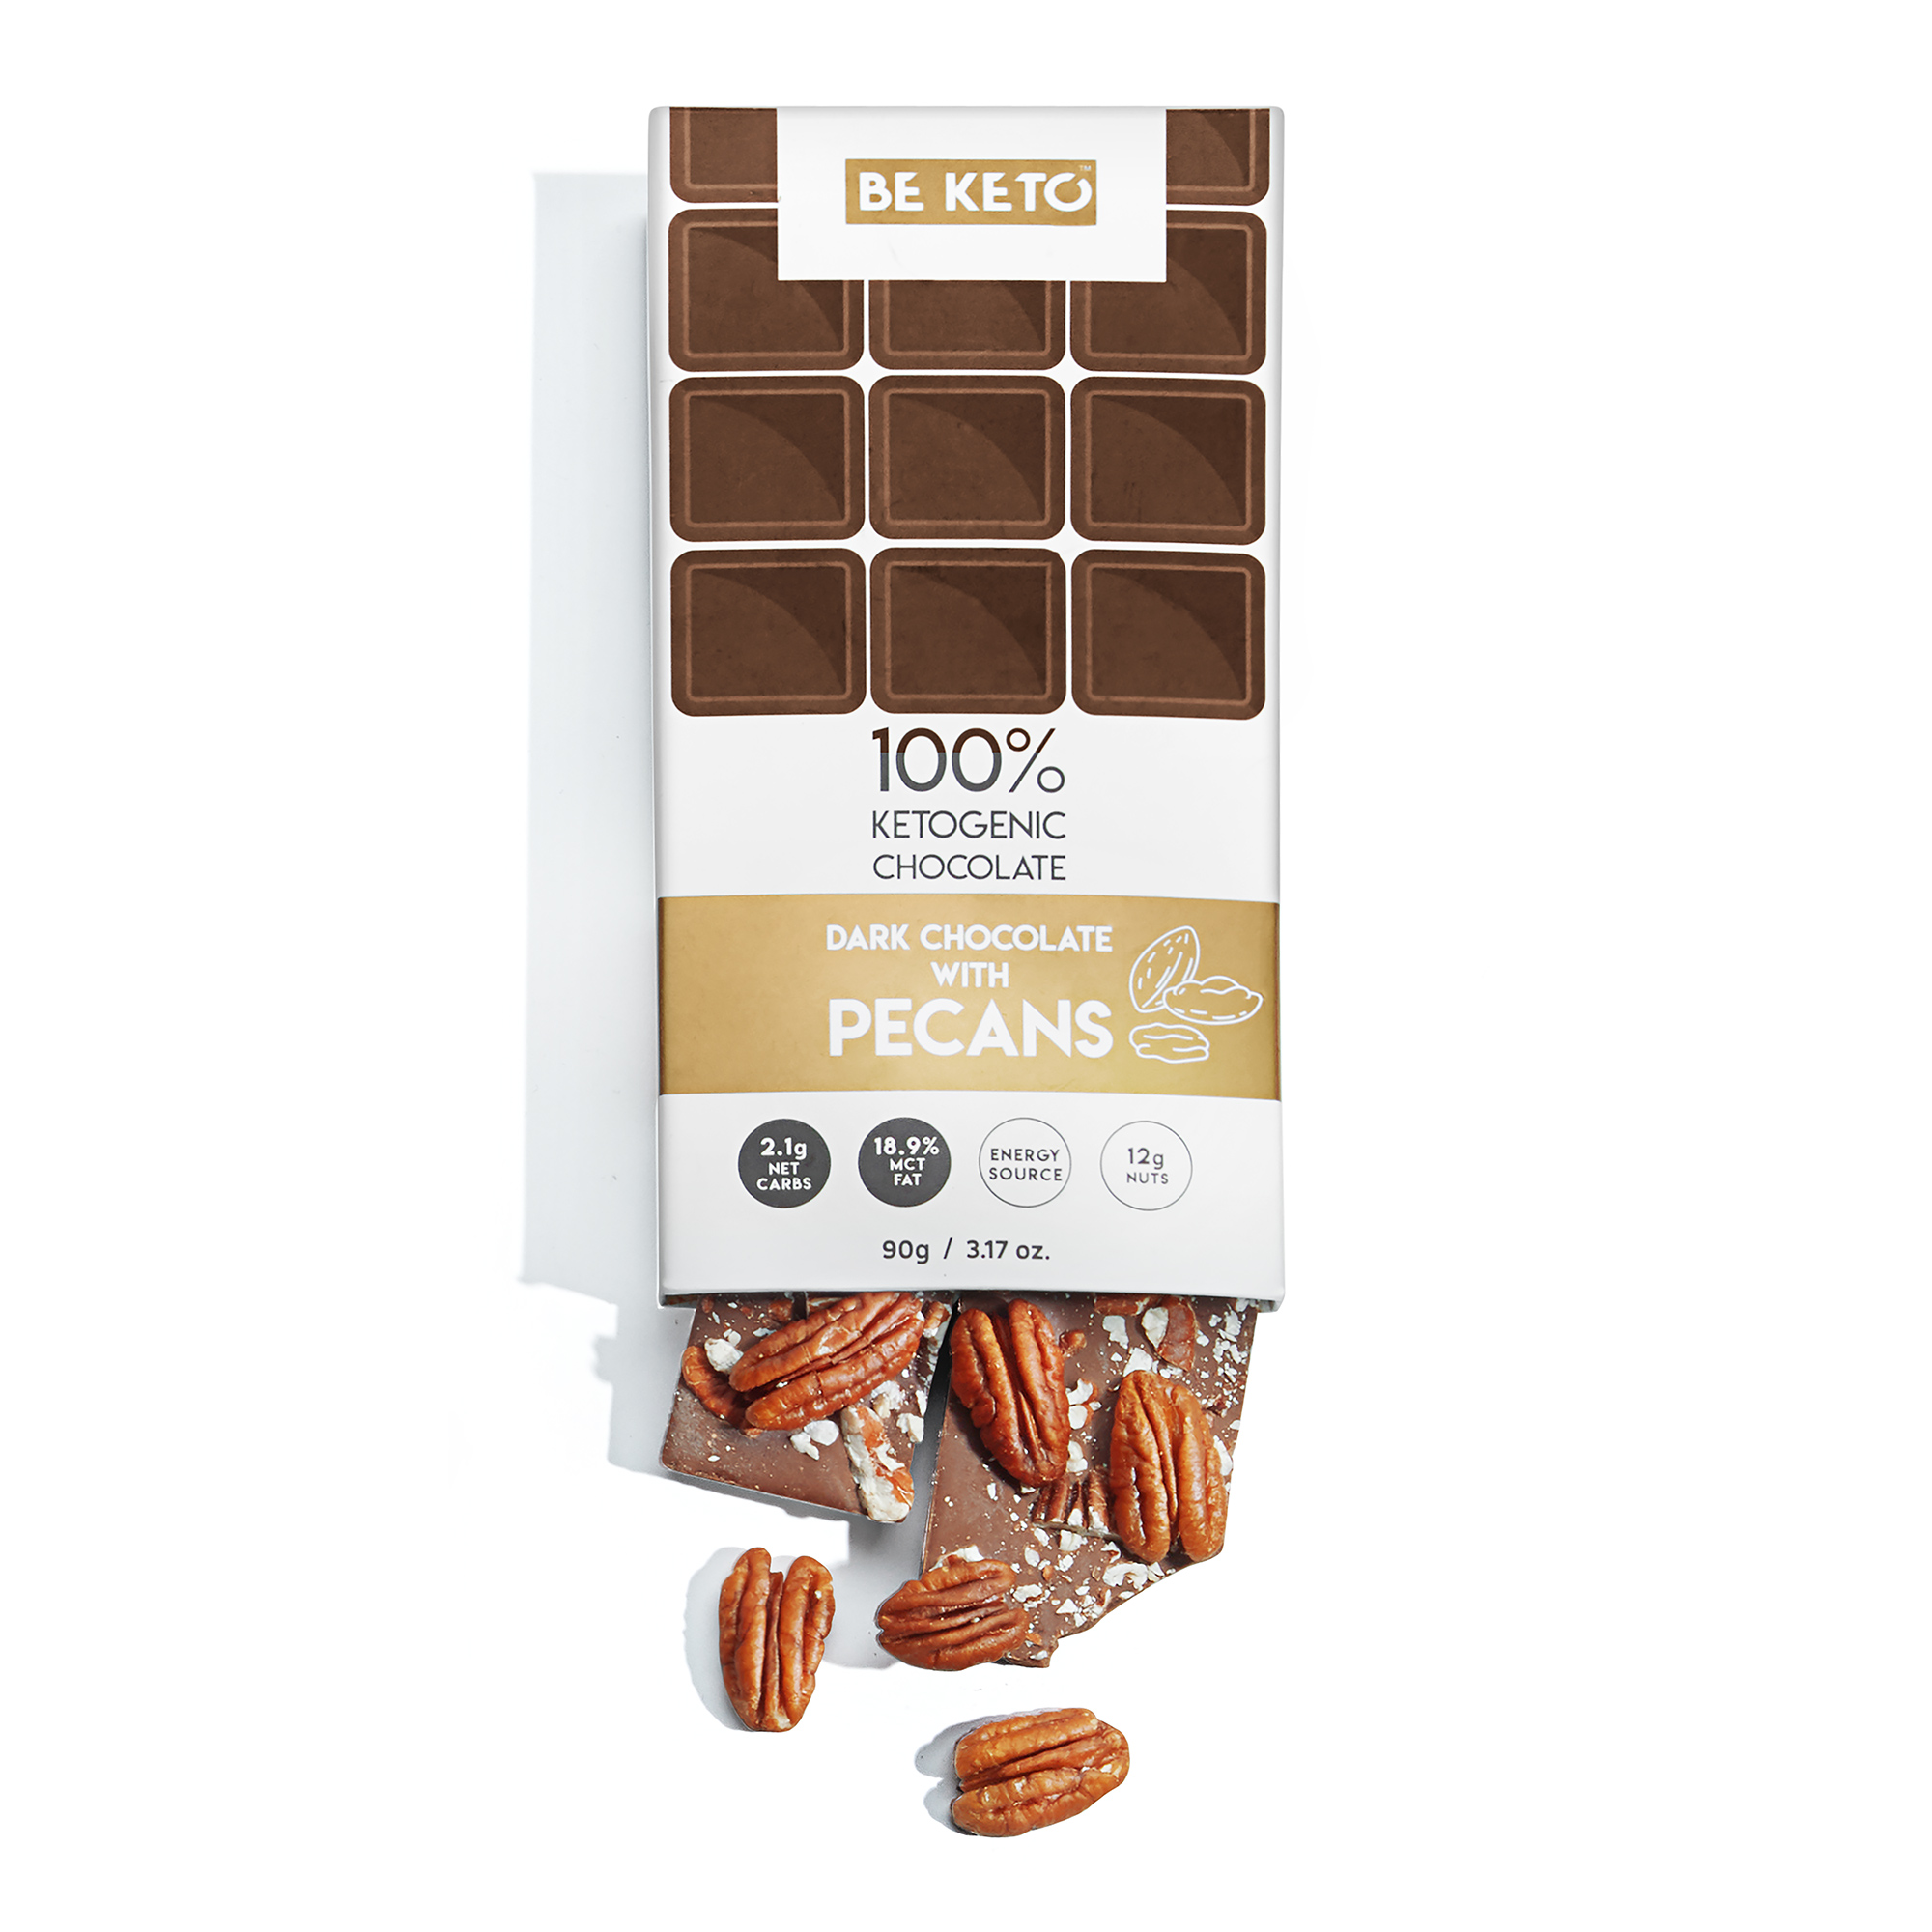 Keto Chocolate + MCT Oil - Pecans